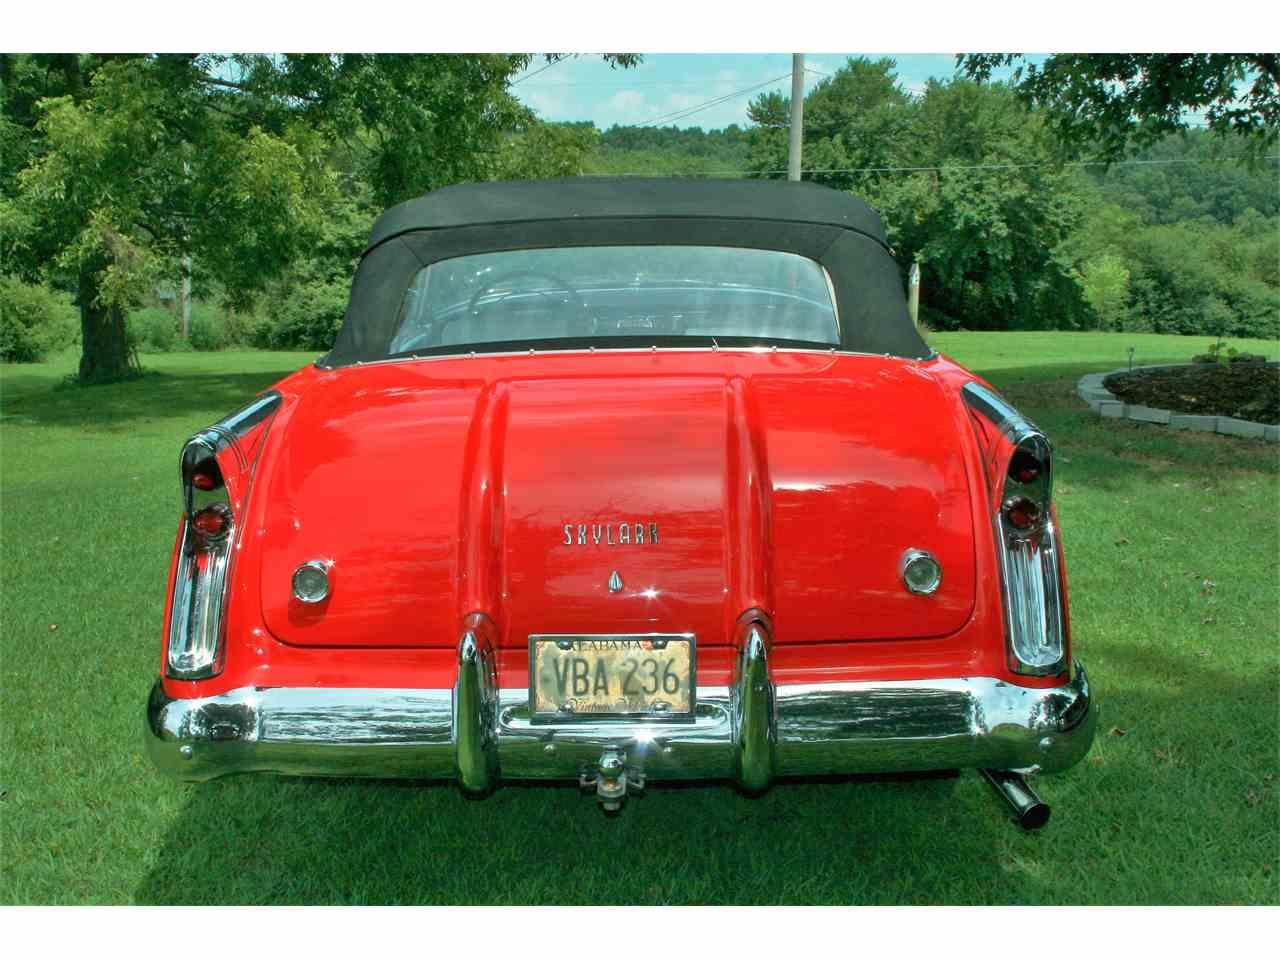 1954 Buick Skylark For Sale Classiccars Com Cc 987439